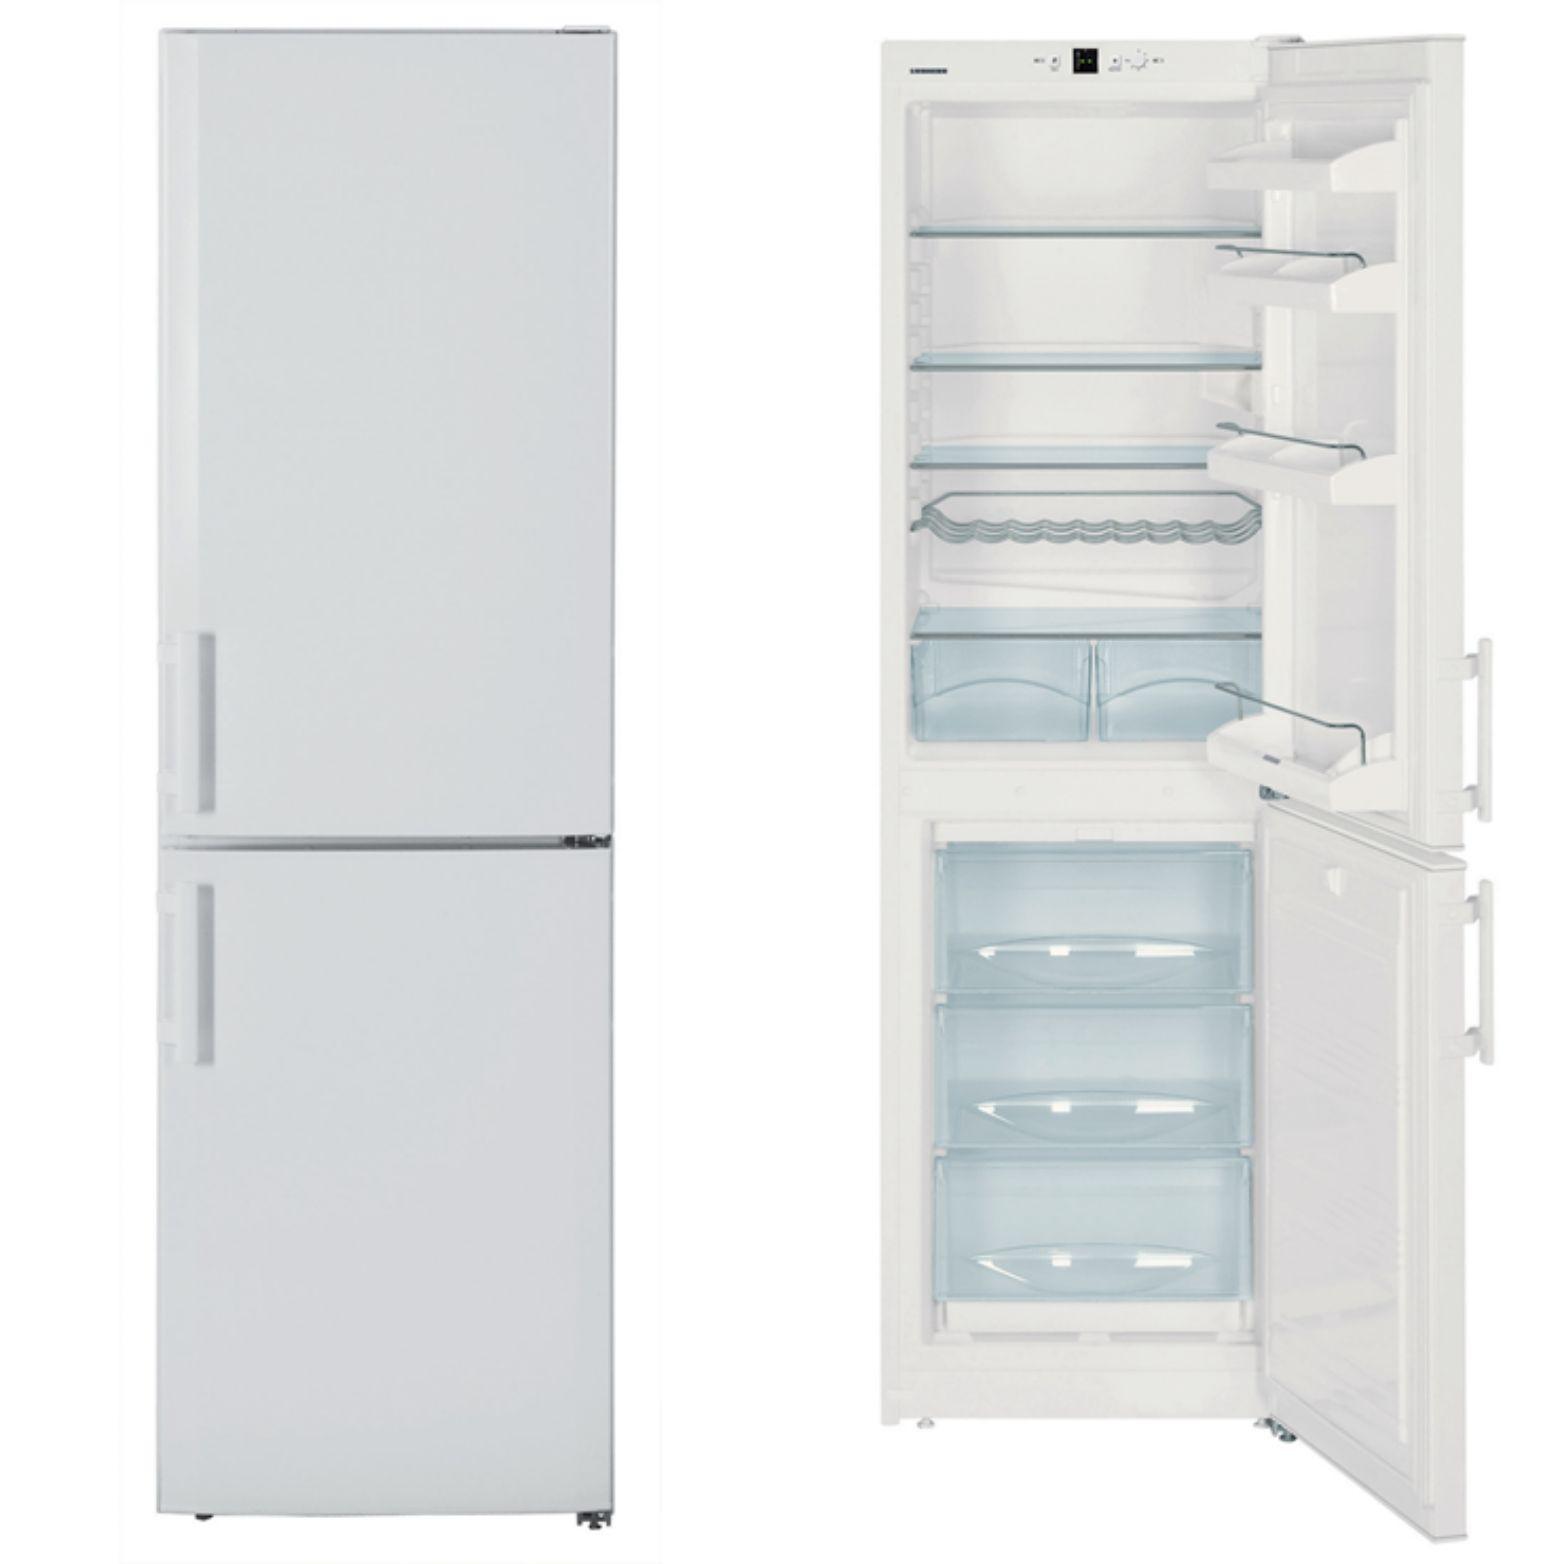 Liebherr CUN3033 55cm A+ Frost Free Fridge Freezer in White £248.99 @ CoOp